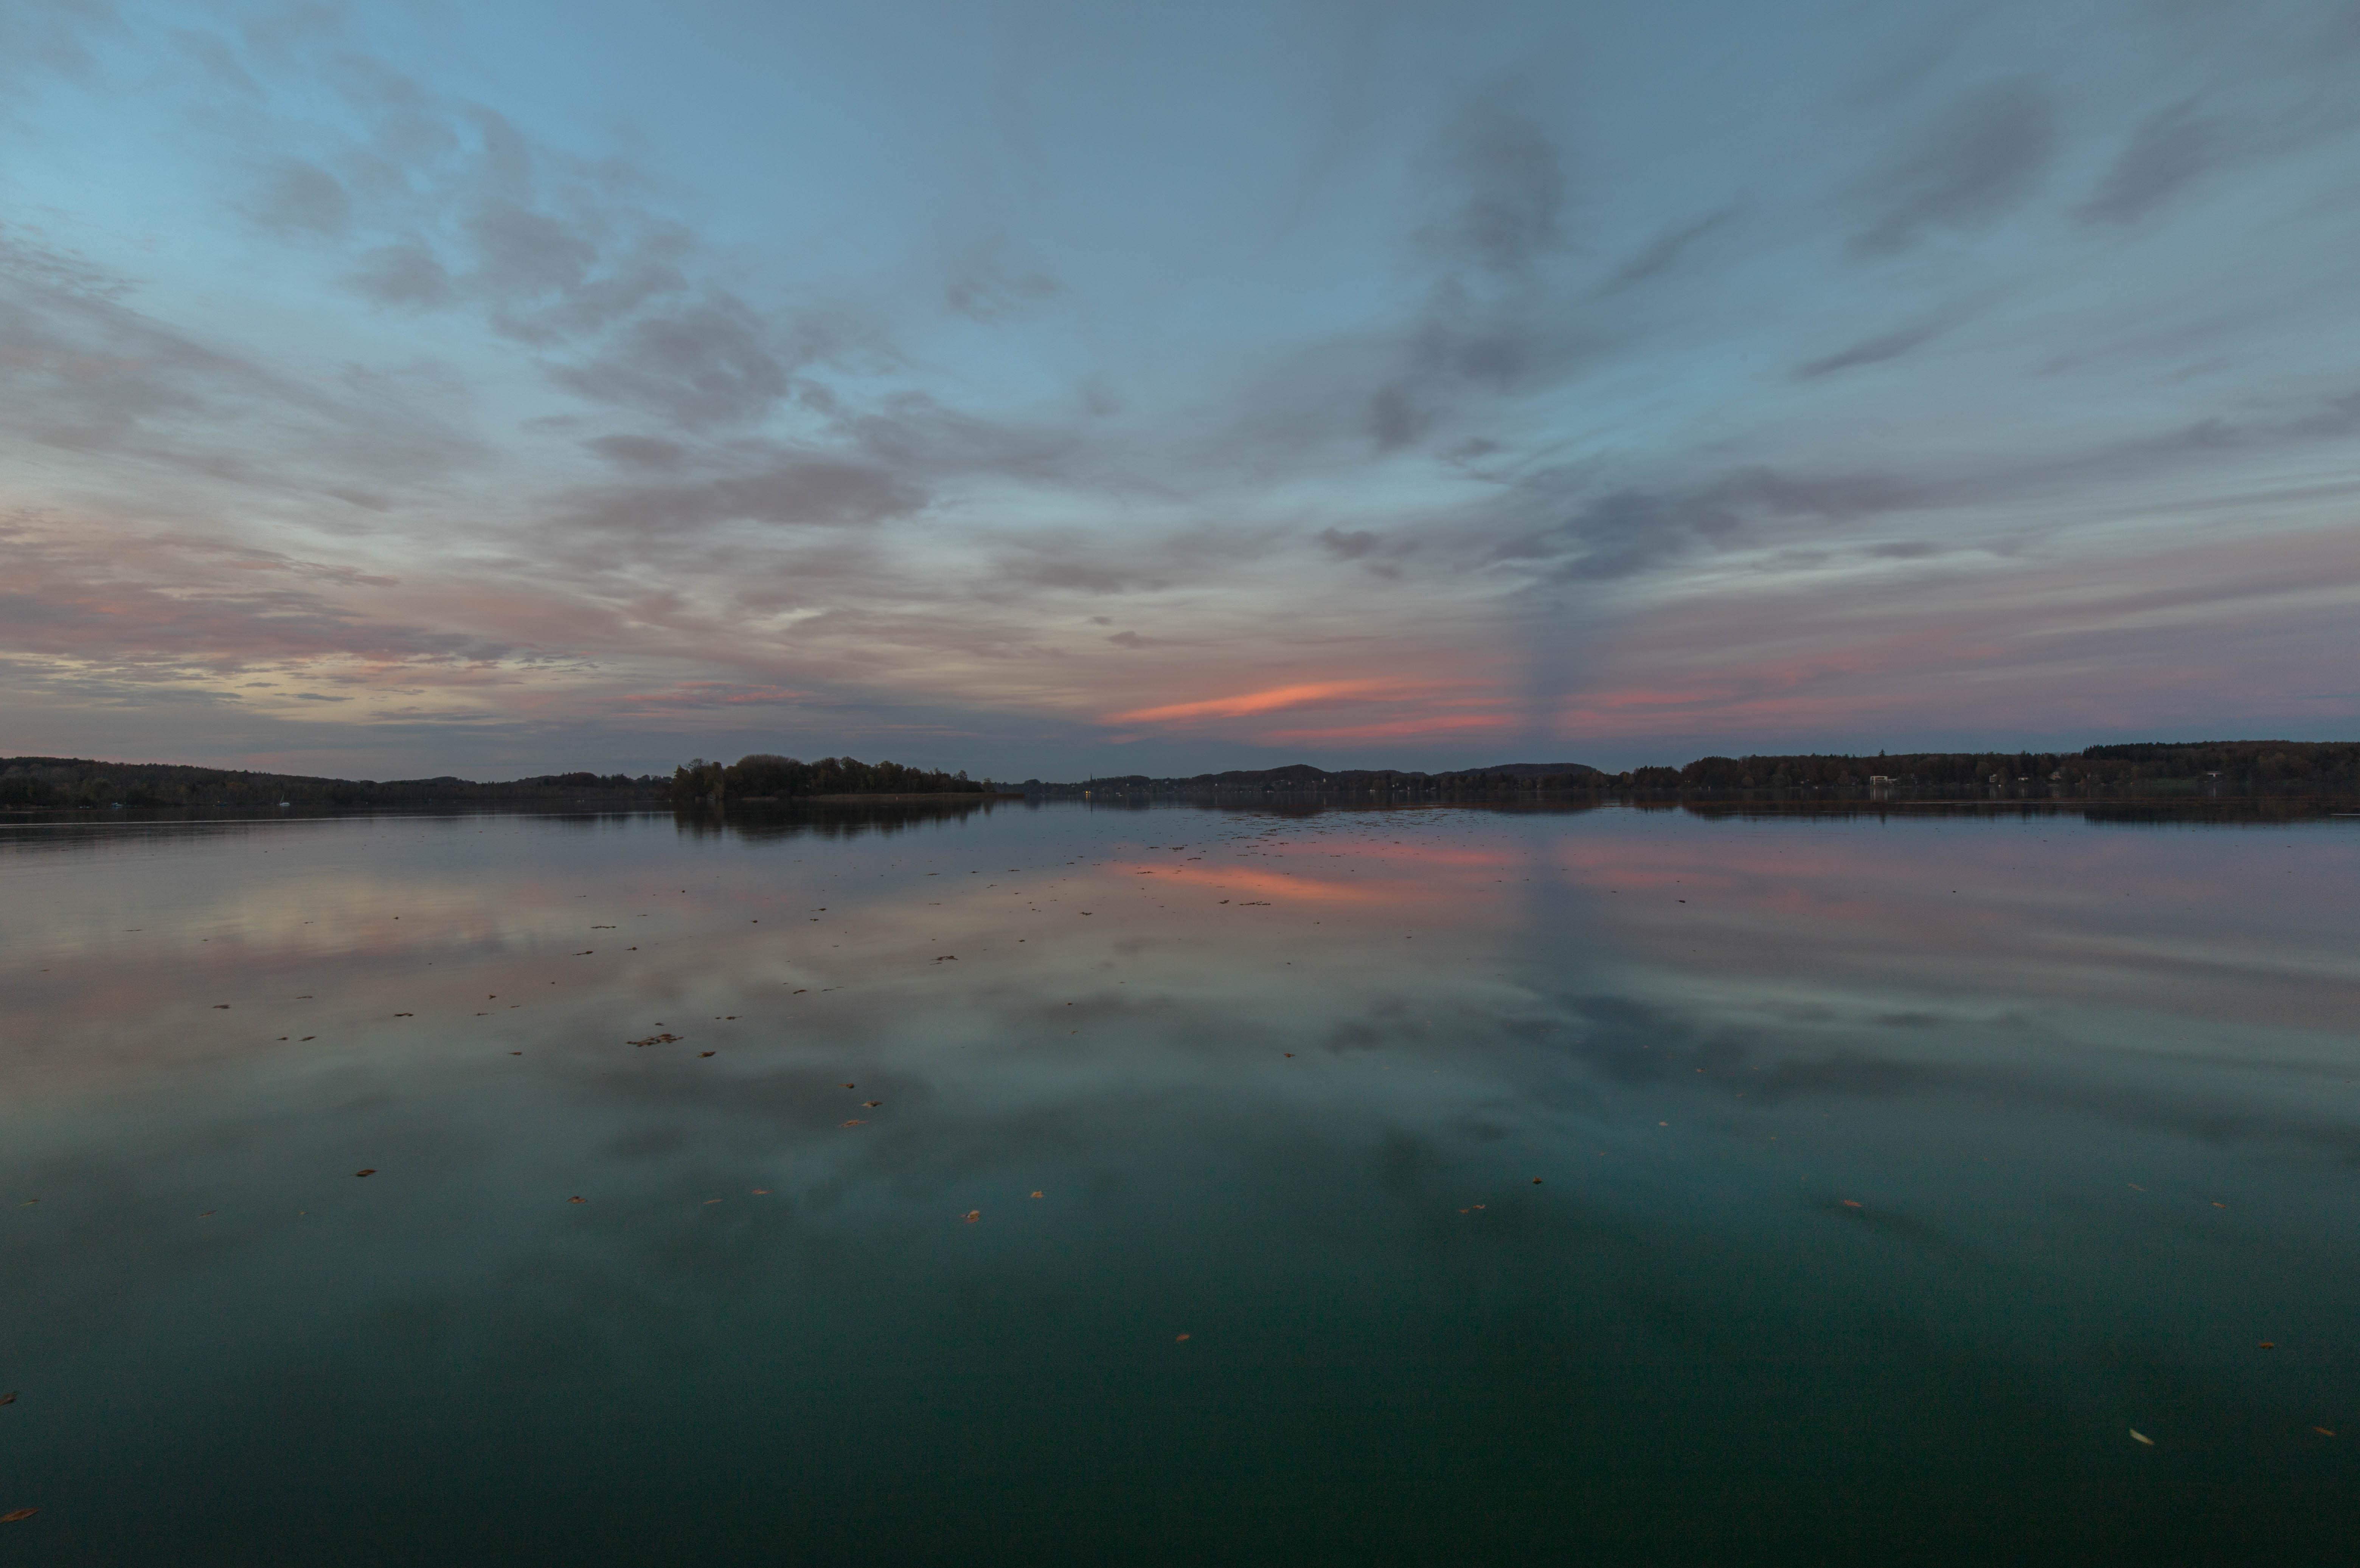 Sonnenuntergang am Wörthsee